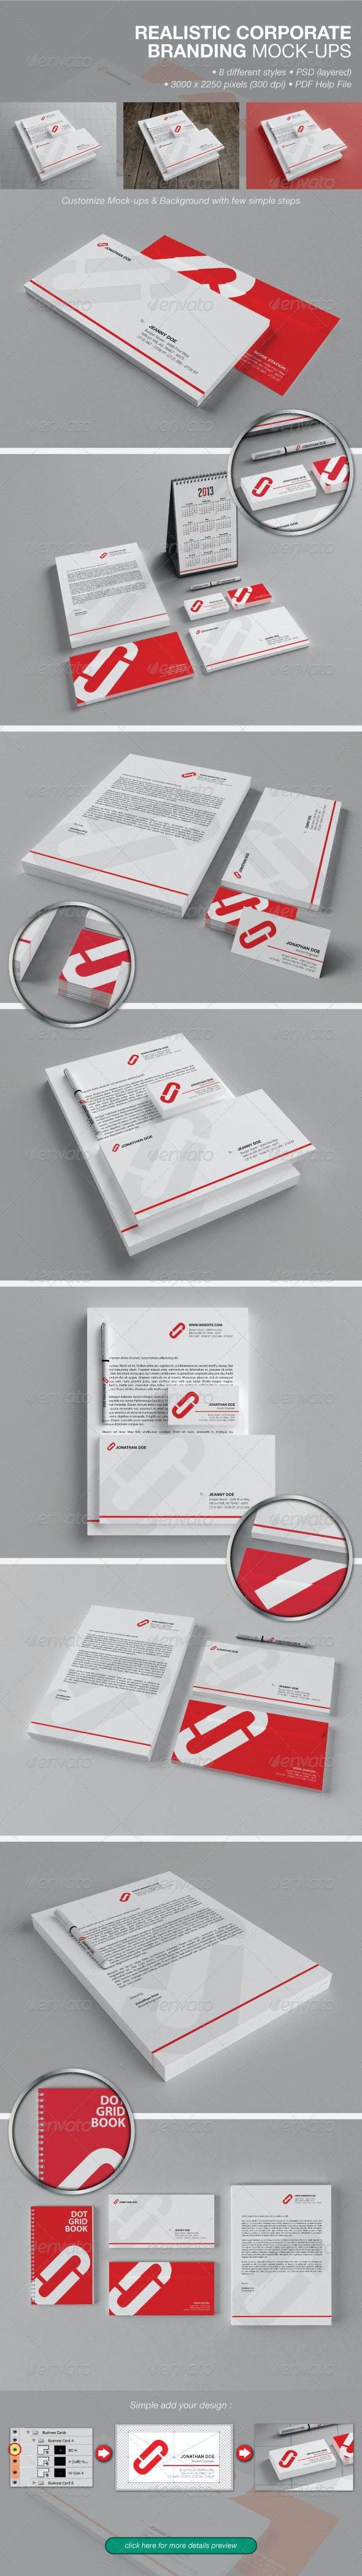 Realistic Corporate Branding Mock-ups - Product Mock-Ups Graphics